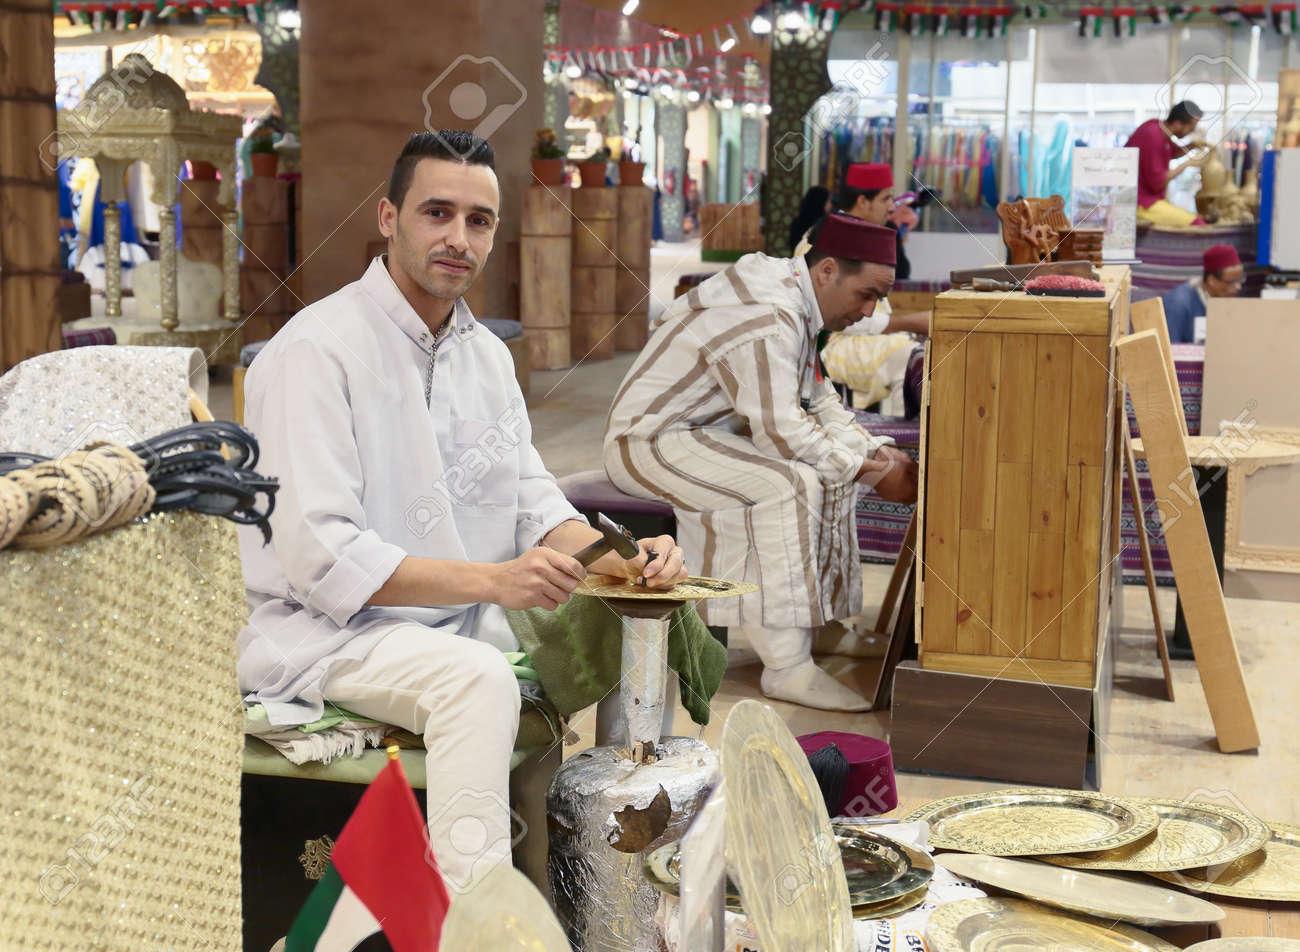 DUBAI, UAE - DECEMBER 4, 2017: Minter artisan in national clothes